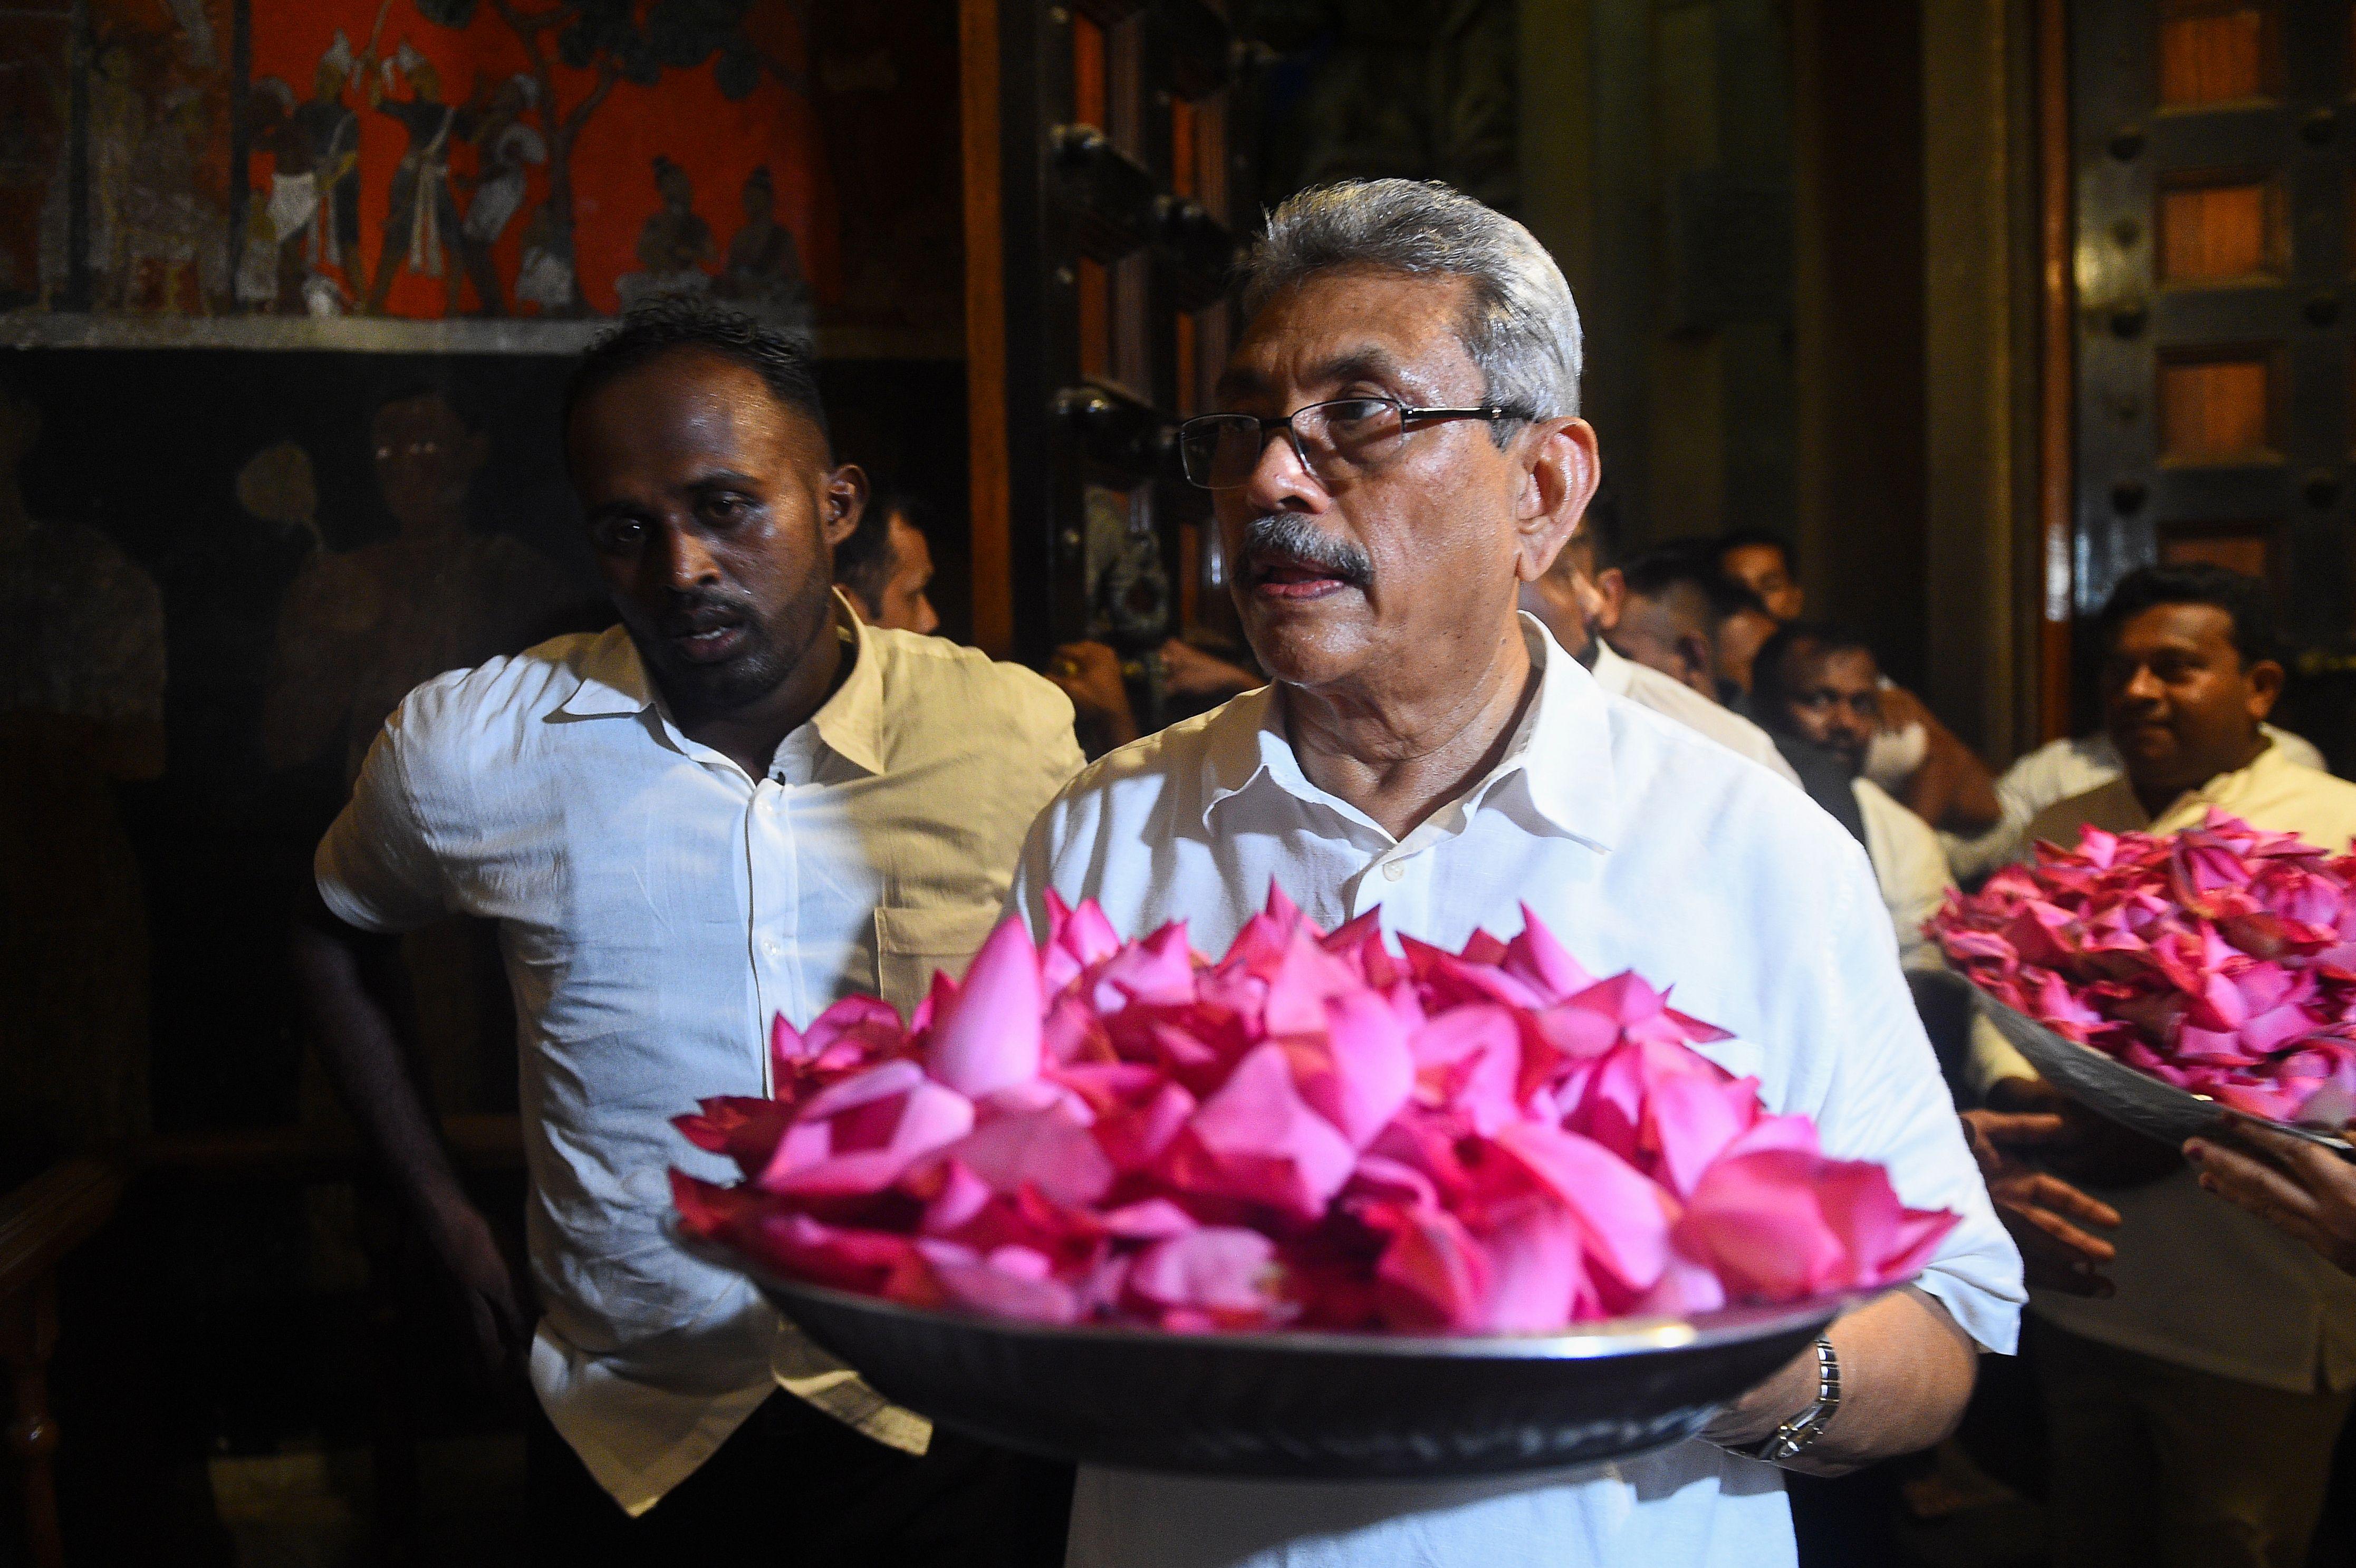 Gotabhaya Rajapakse (C), brother of Sri Lanka's opposition leader and former president, visits a Kelaniya Buddhist temple in Kelaniya  (ISHARA S. KODIKARA/AFP/Getty Images)